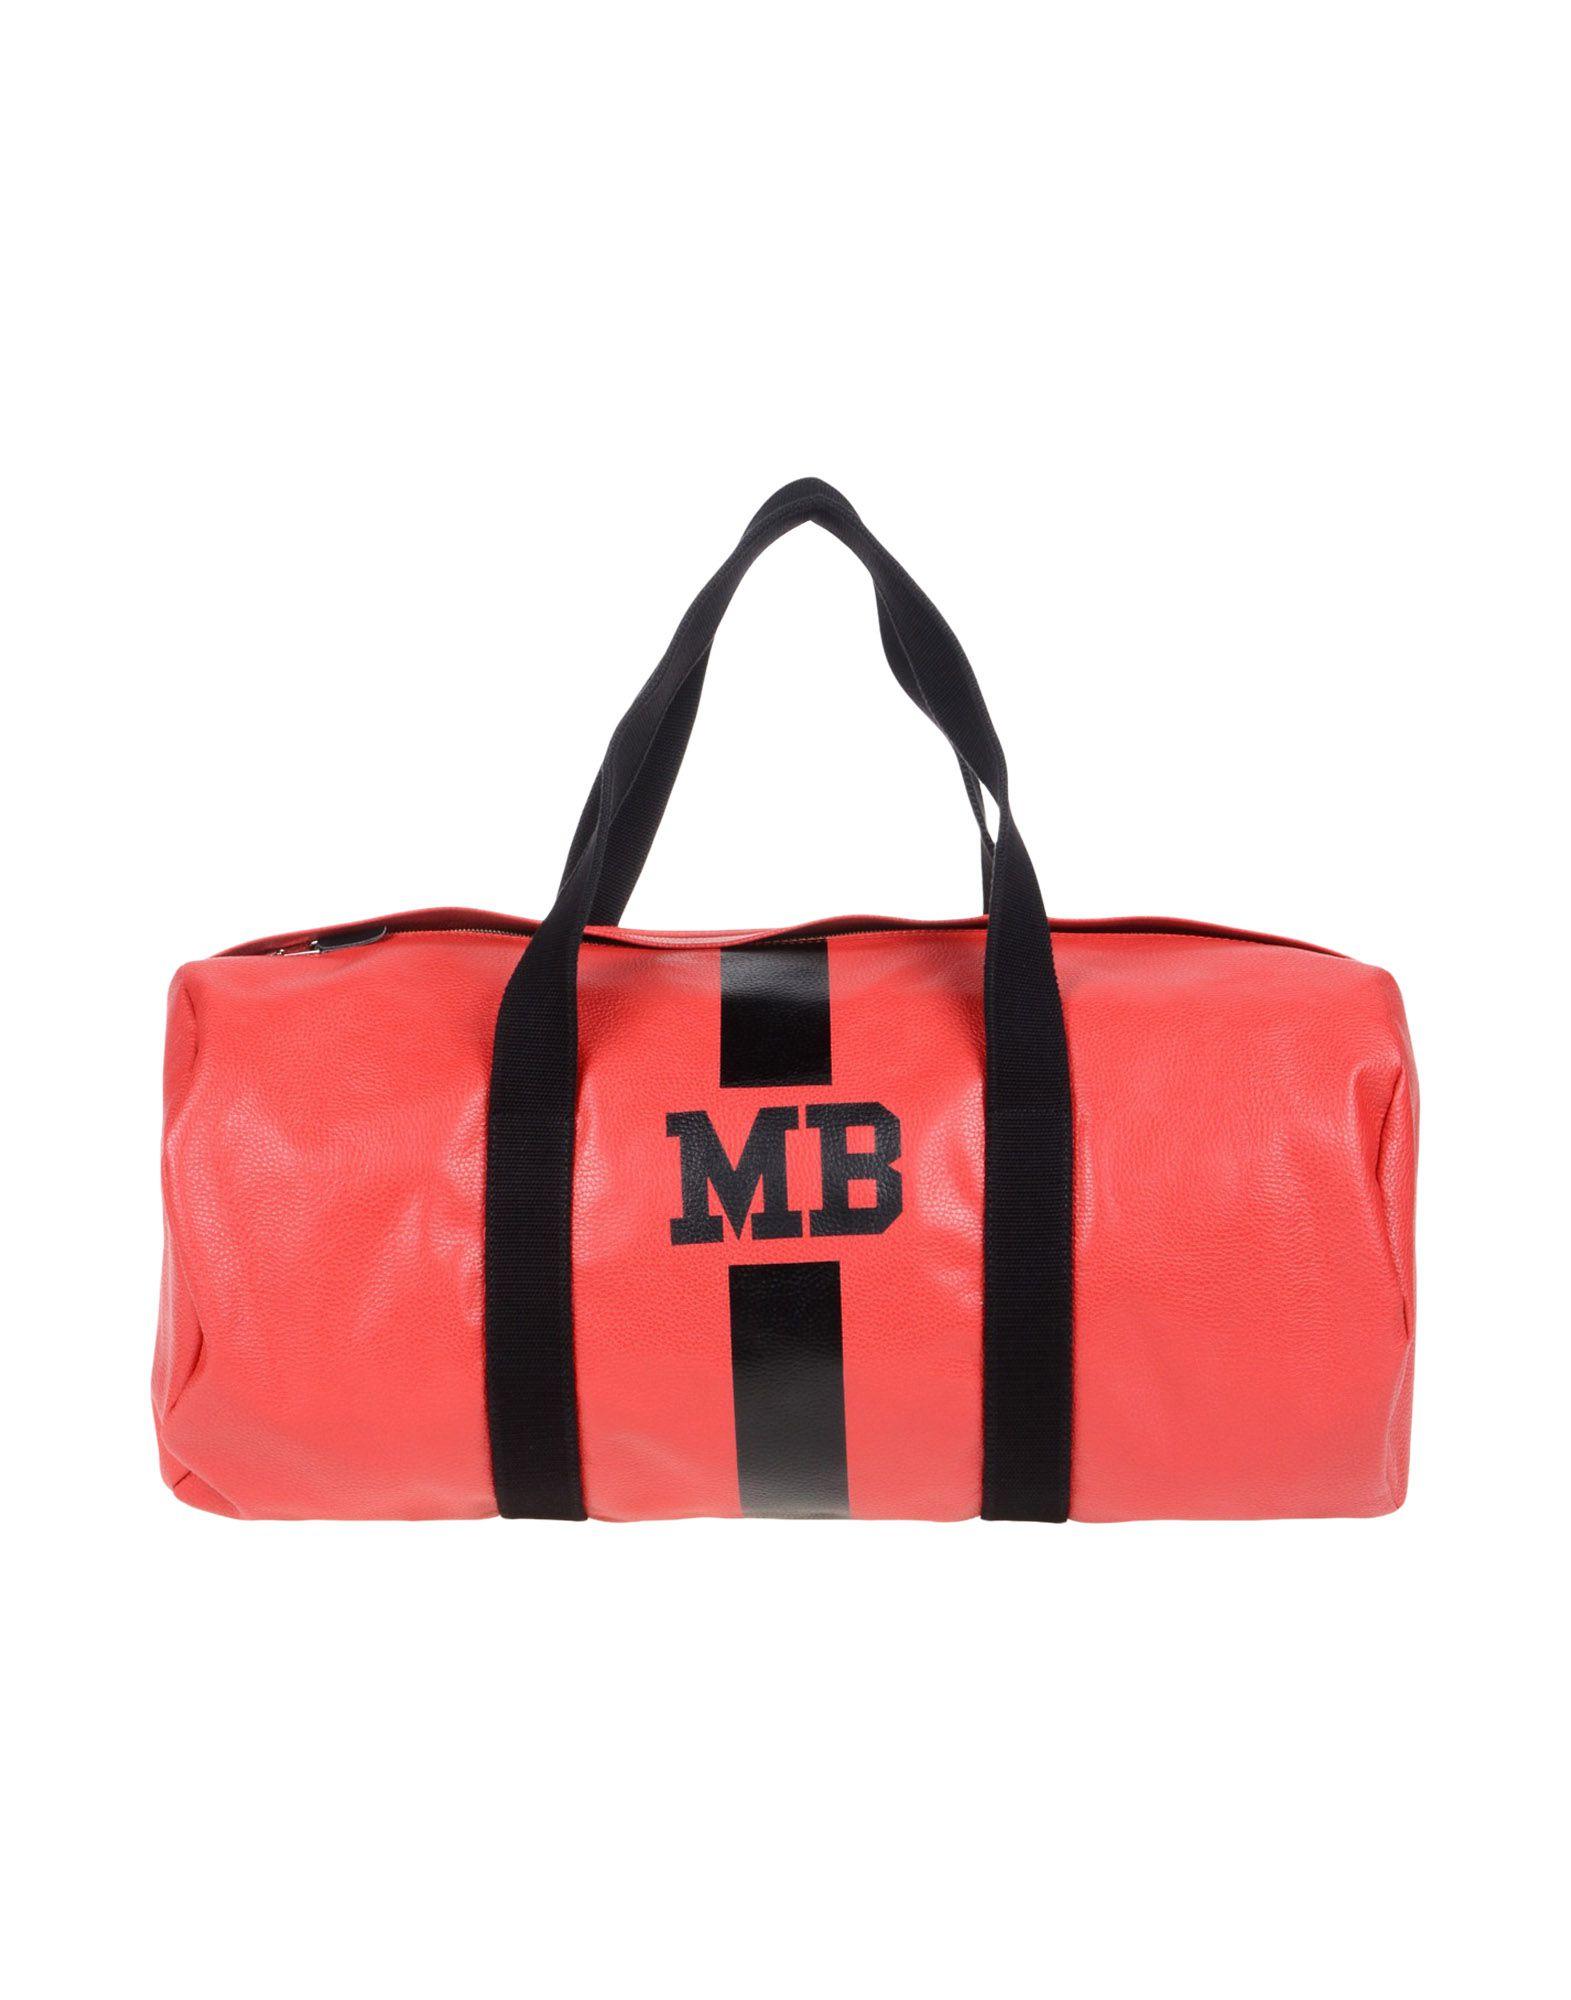 Фото - MIA BAG Дорожная сумка 2017 luxury brand women handbag oil wax leather vintage casual tote large capacity shoulder bag big ladies messenger bag bolsa